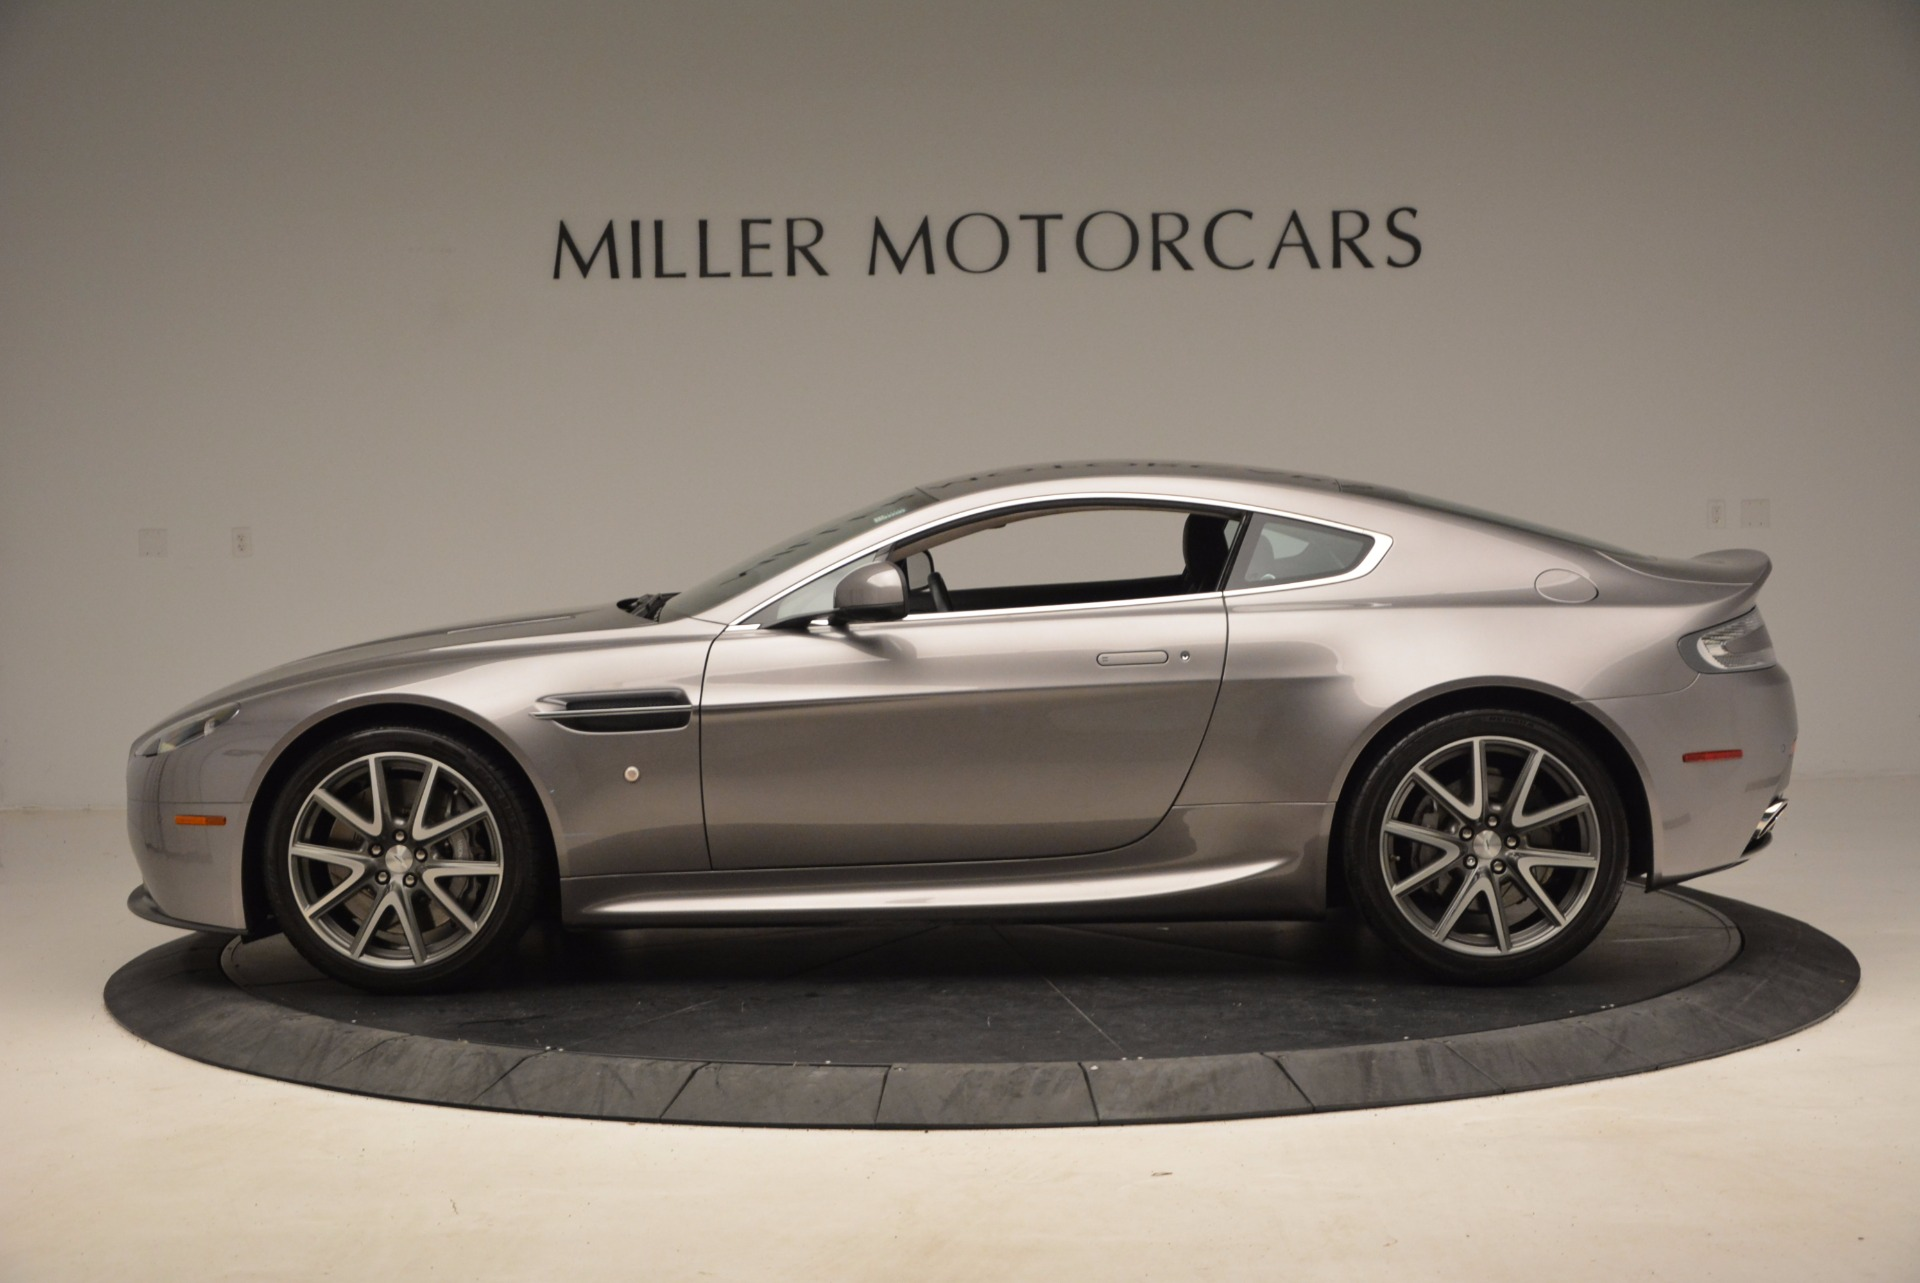 Used 2012 Aston Martin V8 Vantage  For Sale In Greenwich, CT. Alfa Romeo of Greenwich, 7263 1497_p3